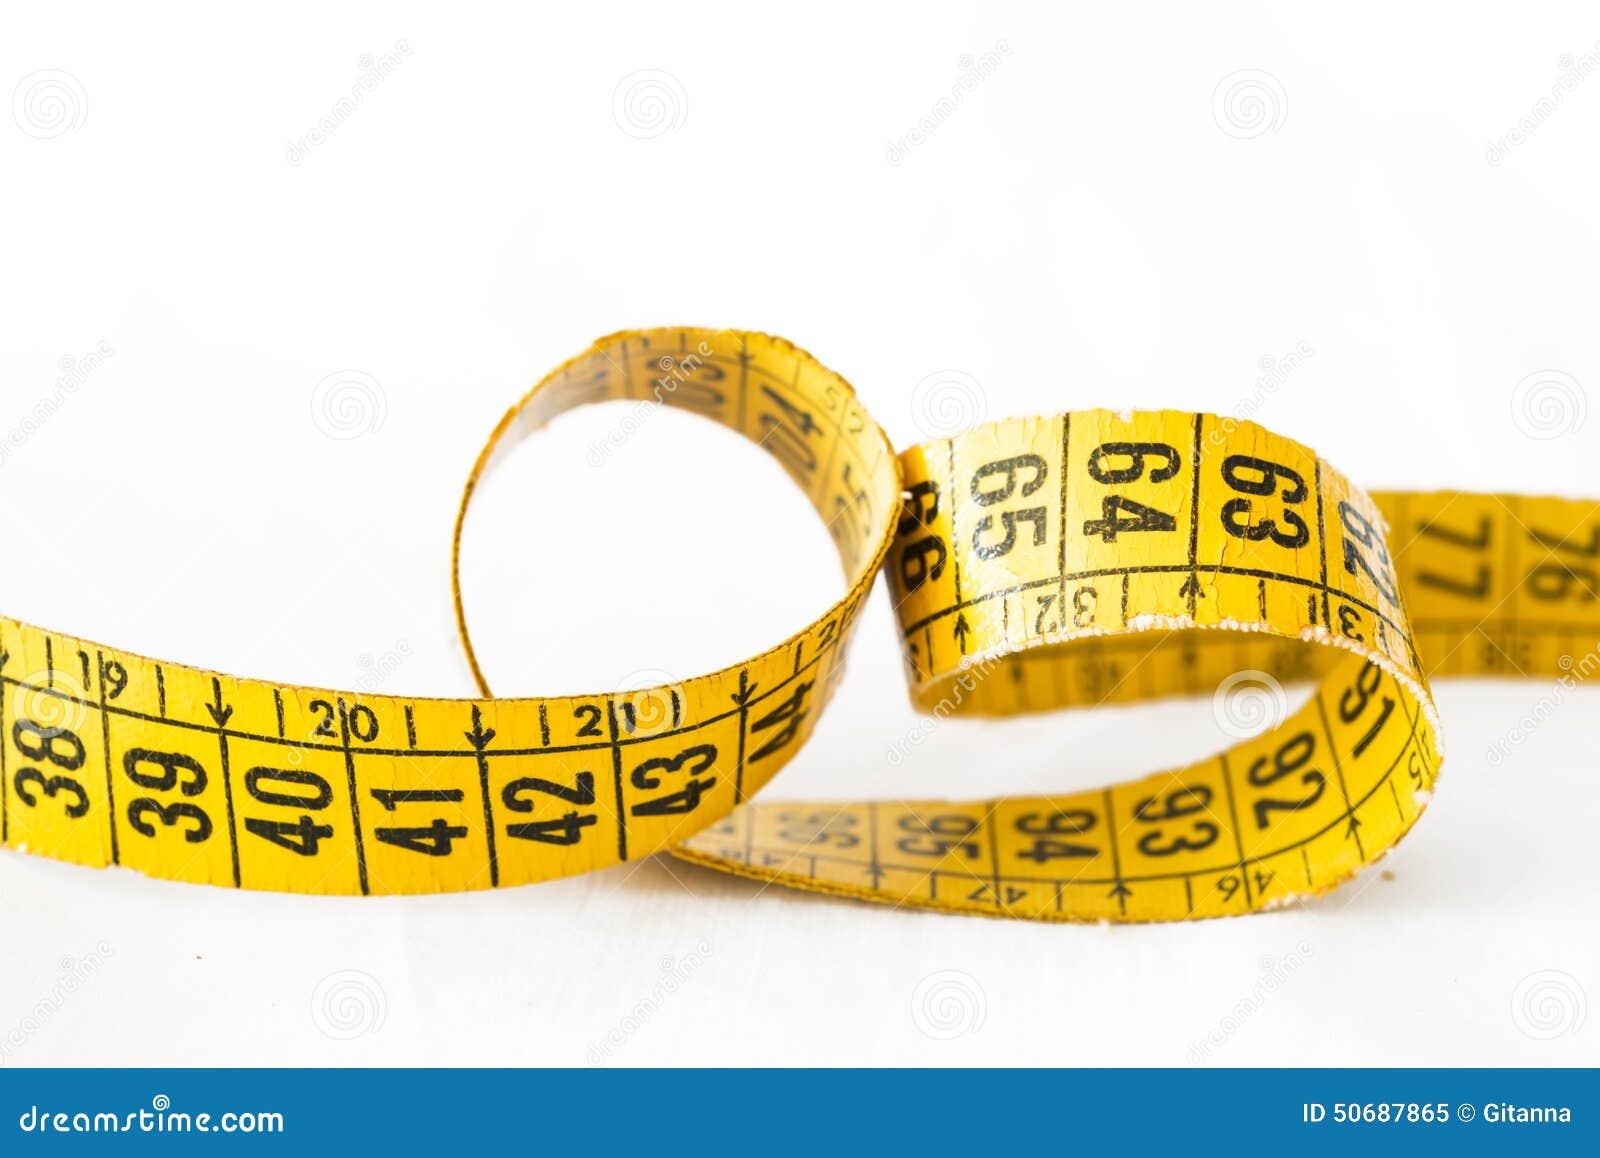 Download 评定的磁带 库存图片. 图片 包括有 统治者, 距离, 超重, 精确度, 投反对票, 缝合, 线路, 评定 - 50687865